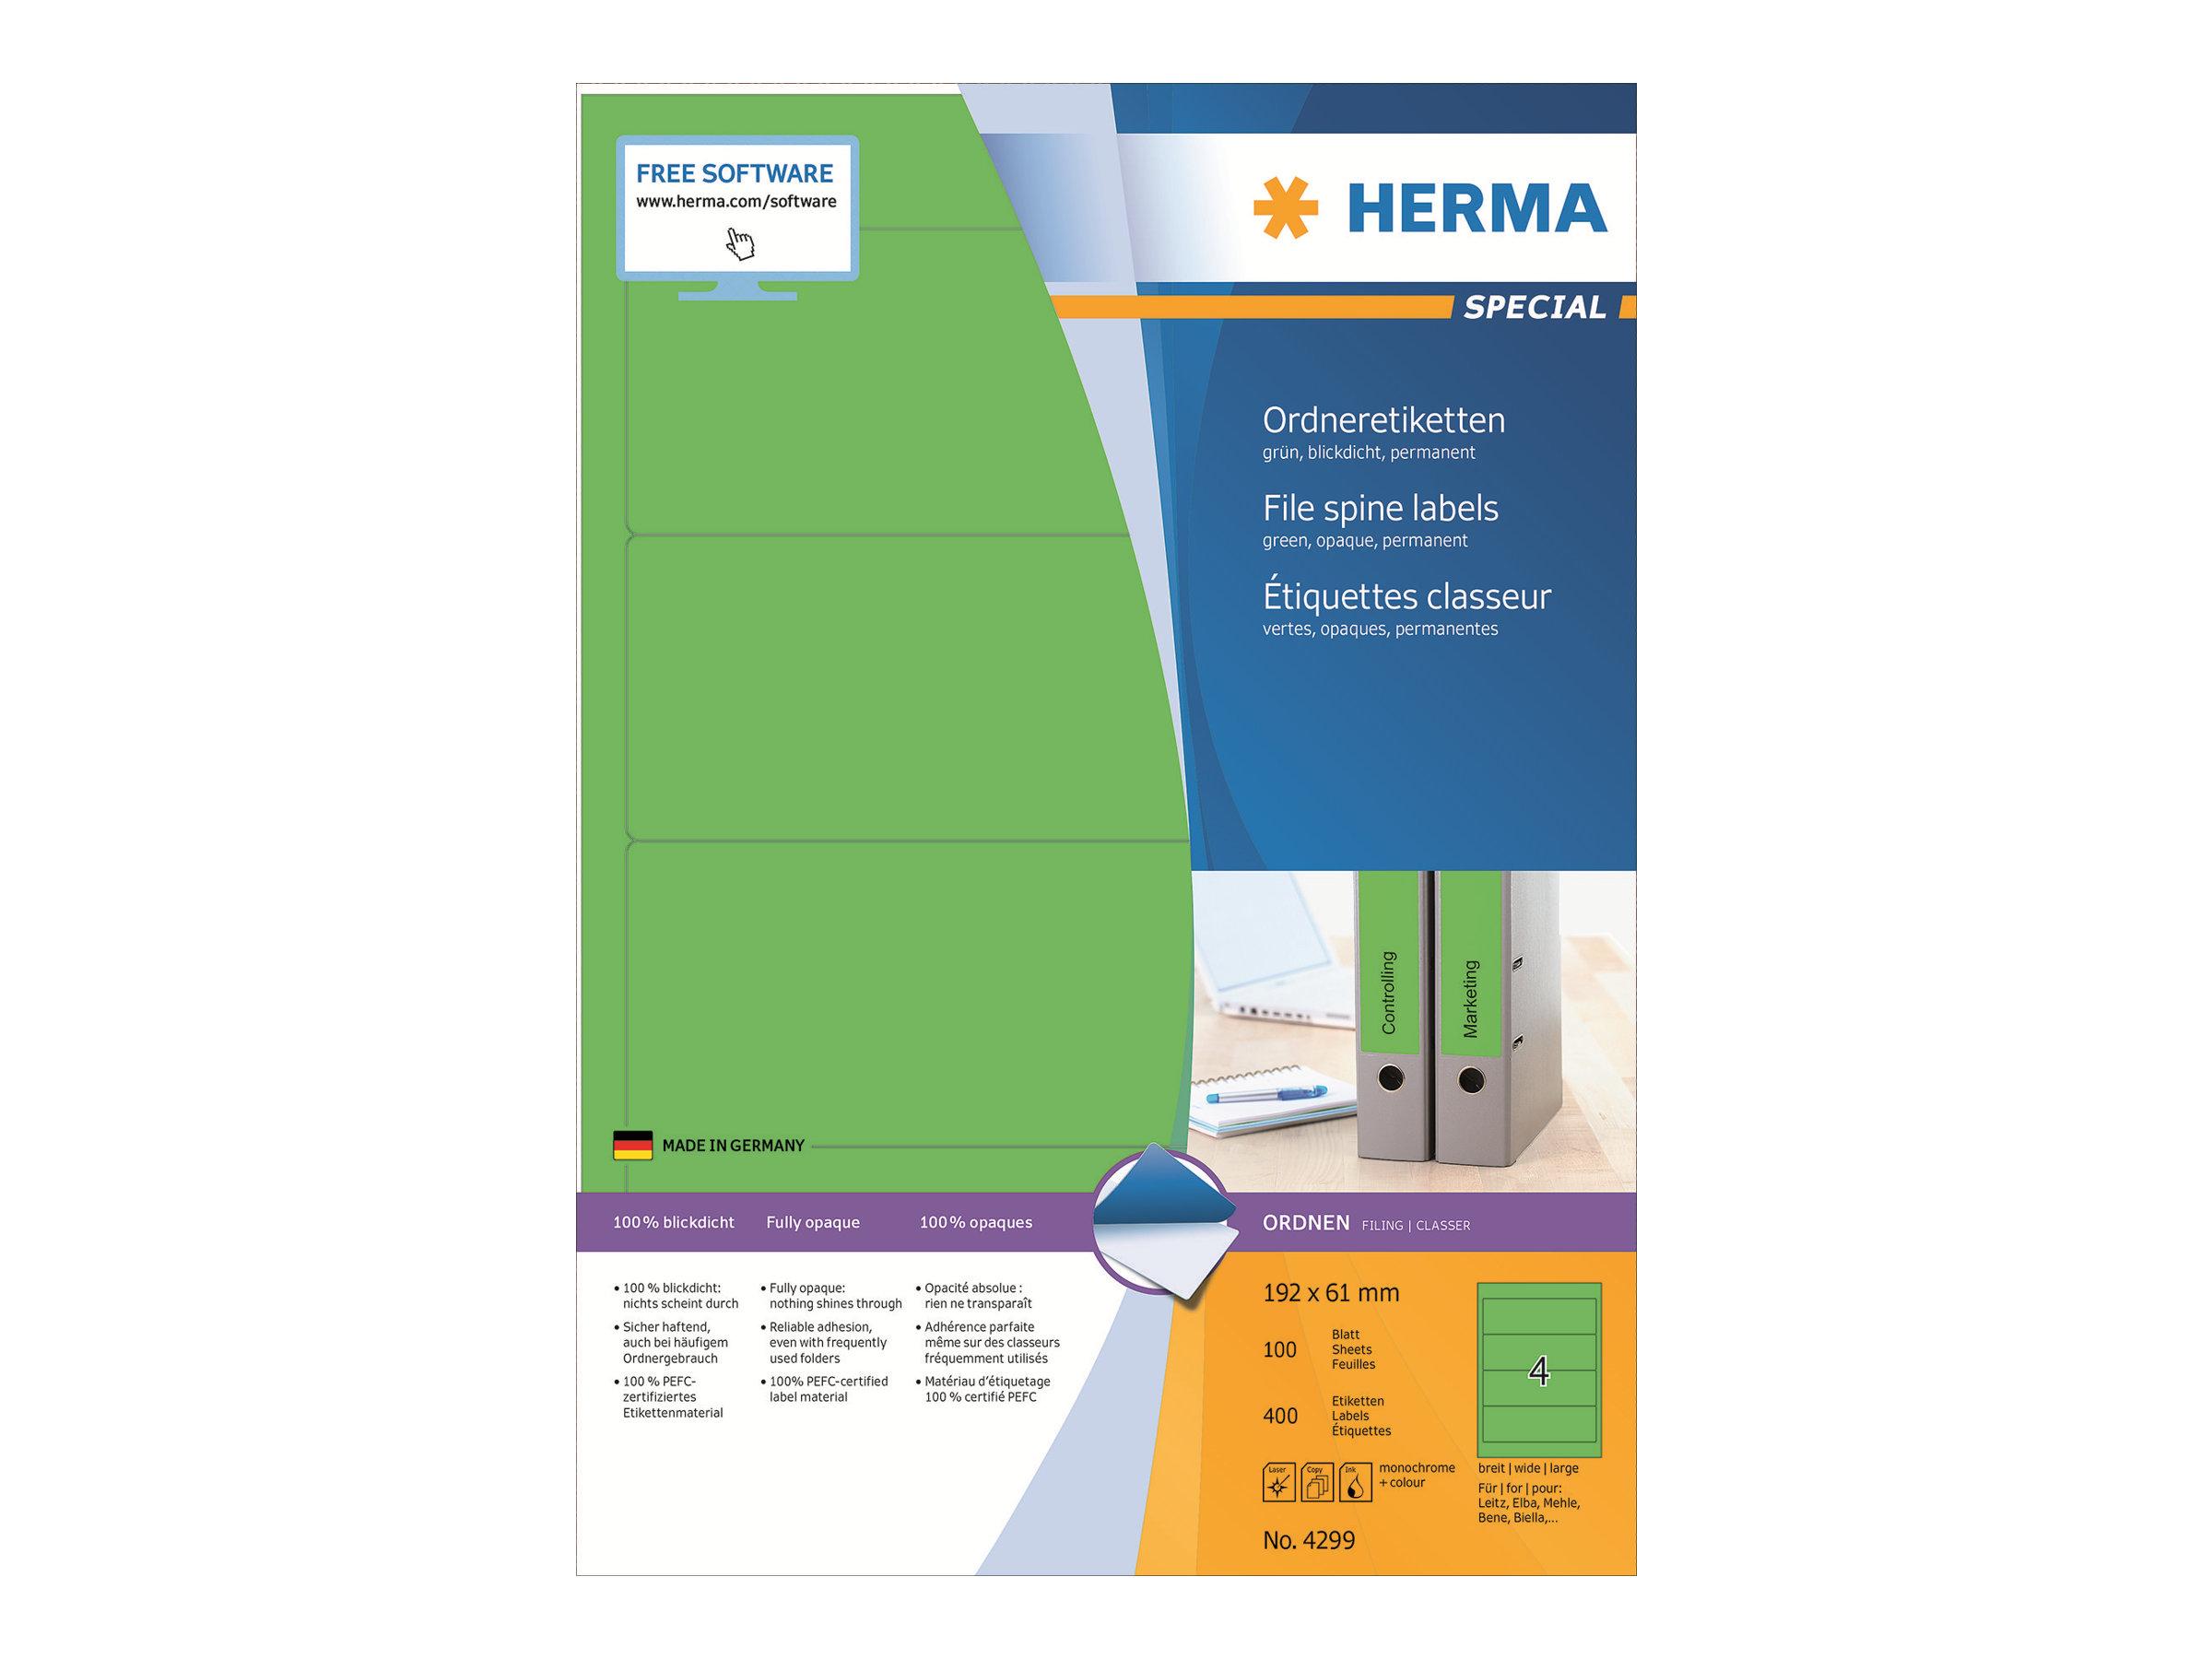 HERMA Special - Papier - matt - permanent selbstklebend - grün - 192 x 61 mm 400 Etikett(en) (100 Bogen x 4)